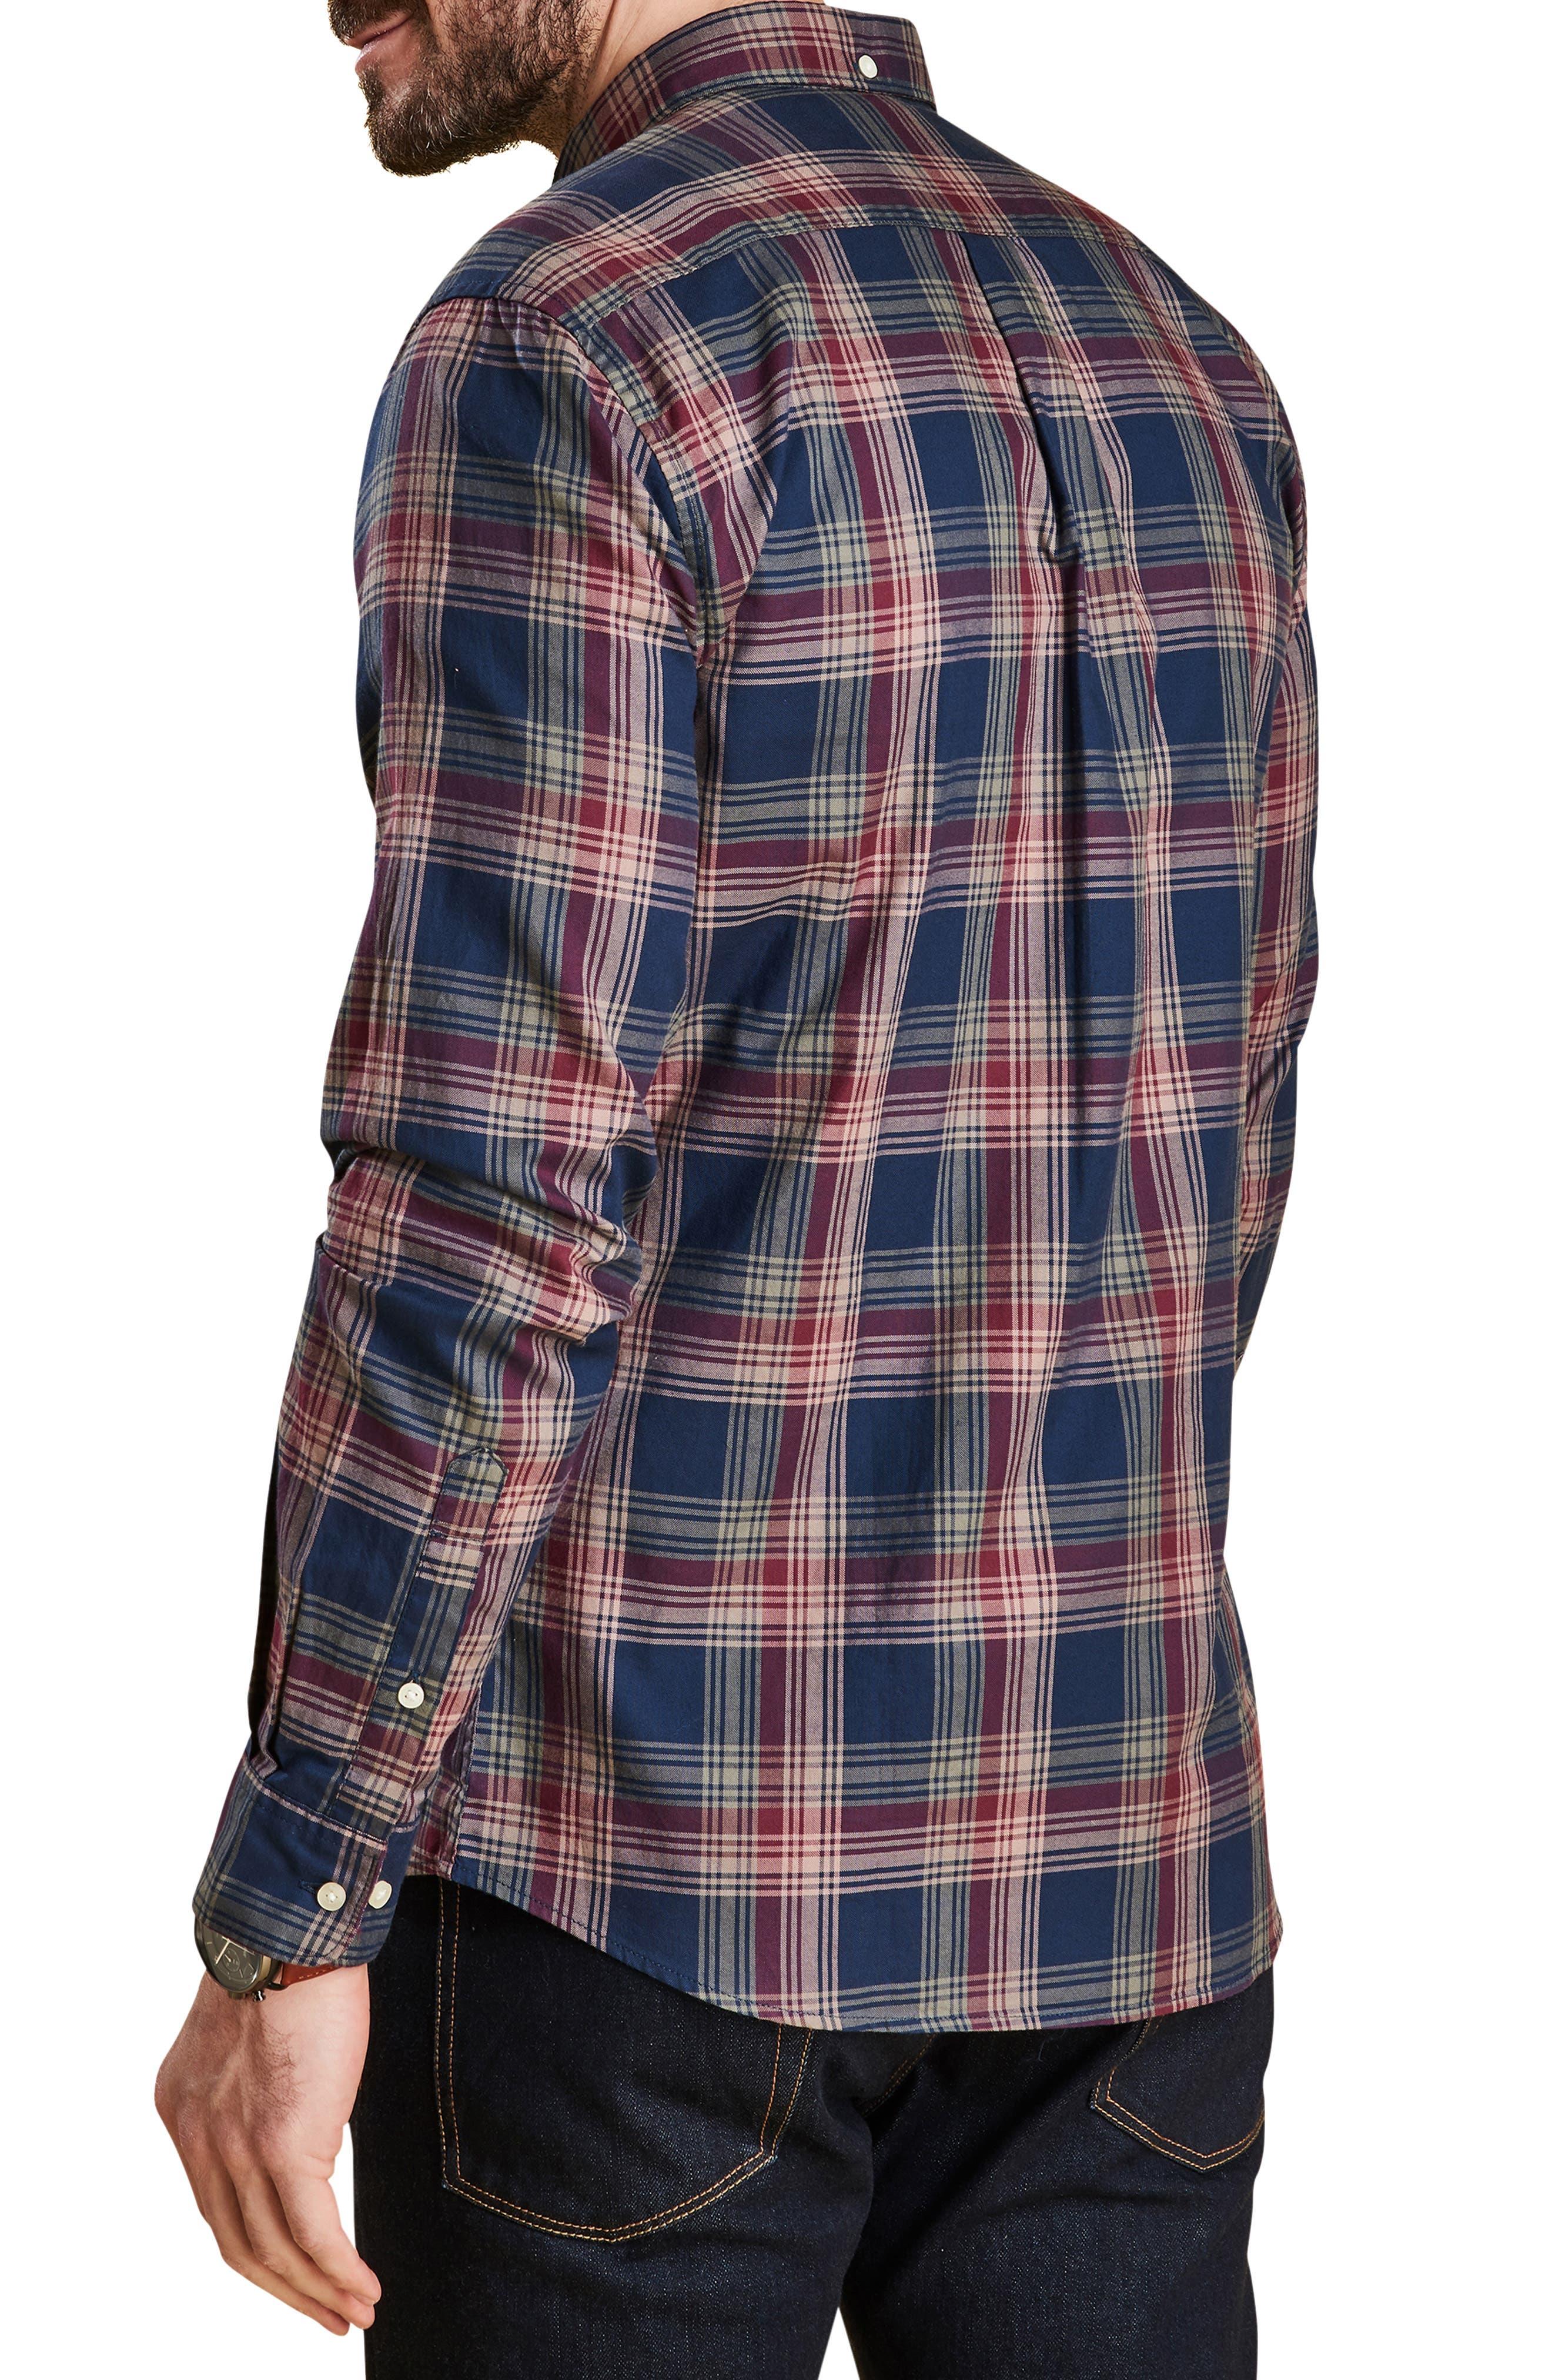 Endsleigh Highland Check Woven Shirt,                             Alternate thumbnail 3, color,                             NAVY